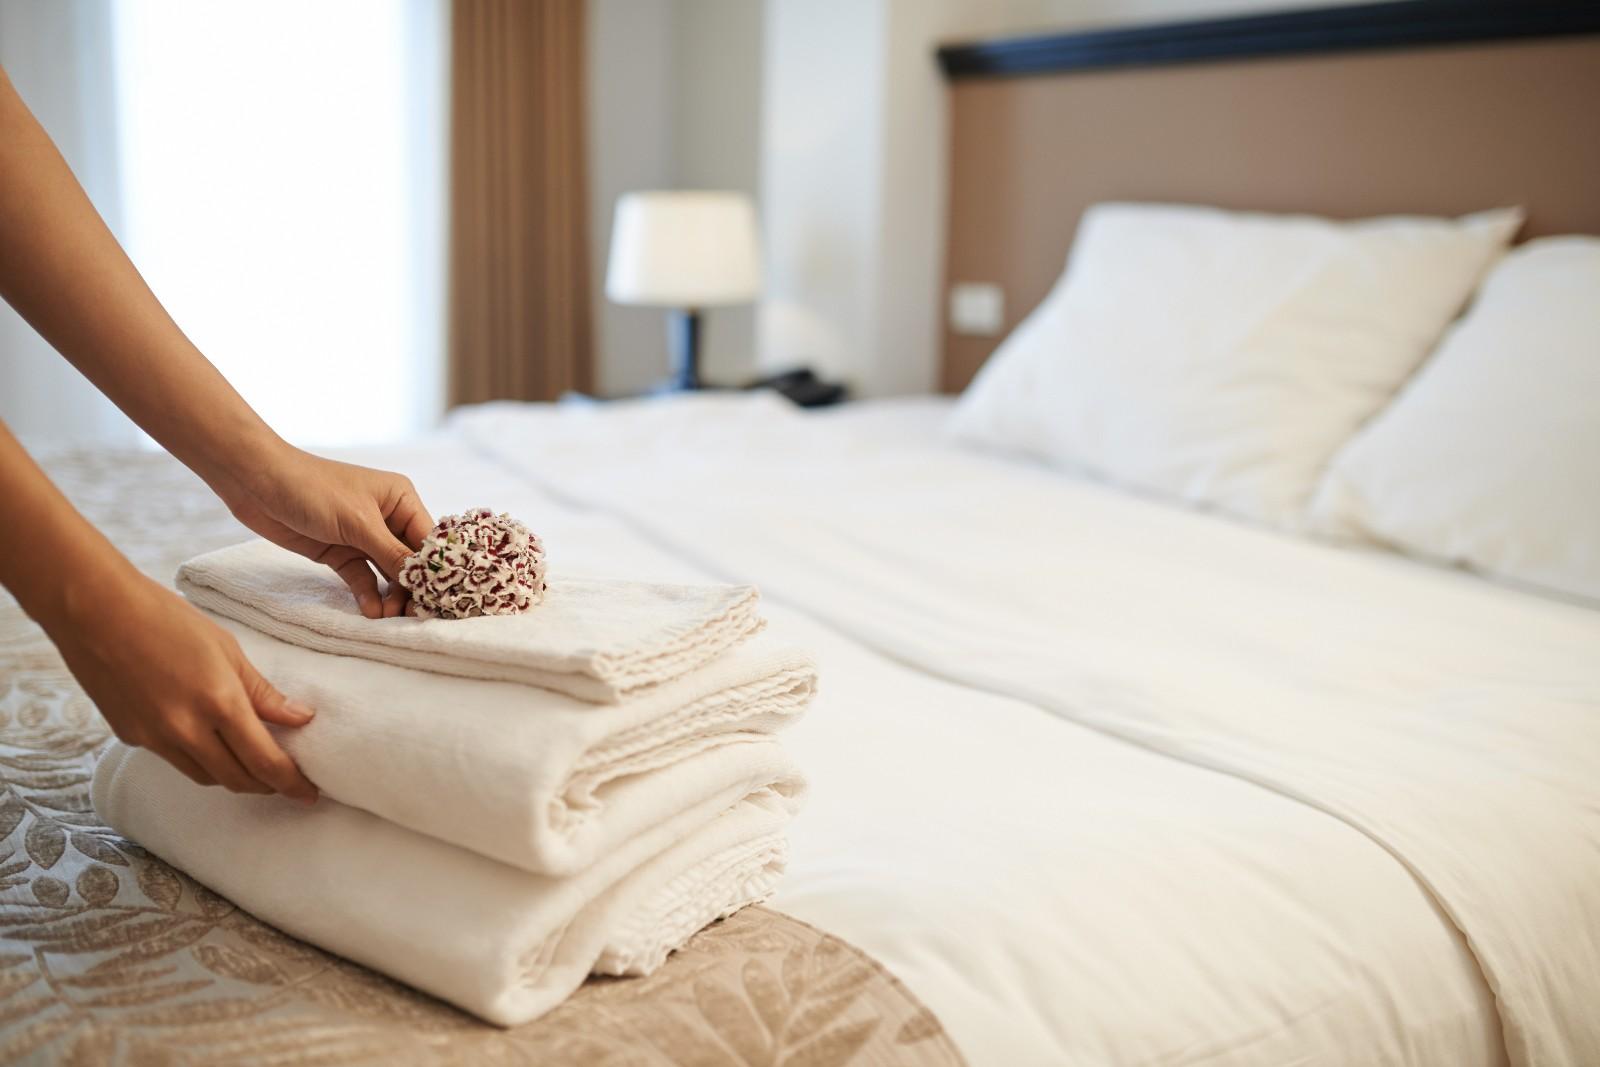 OYO酒店斥资7亿加码根本举措措施晋升,酒店行业